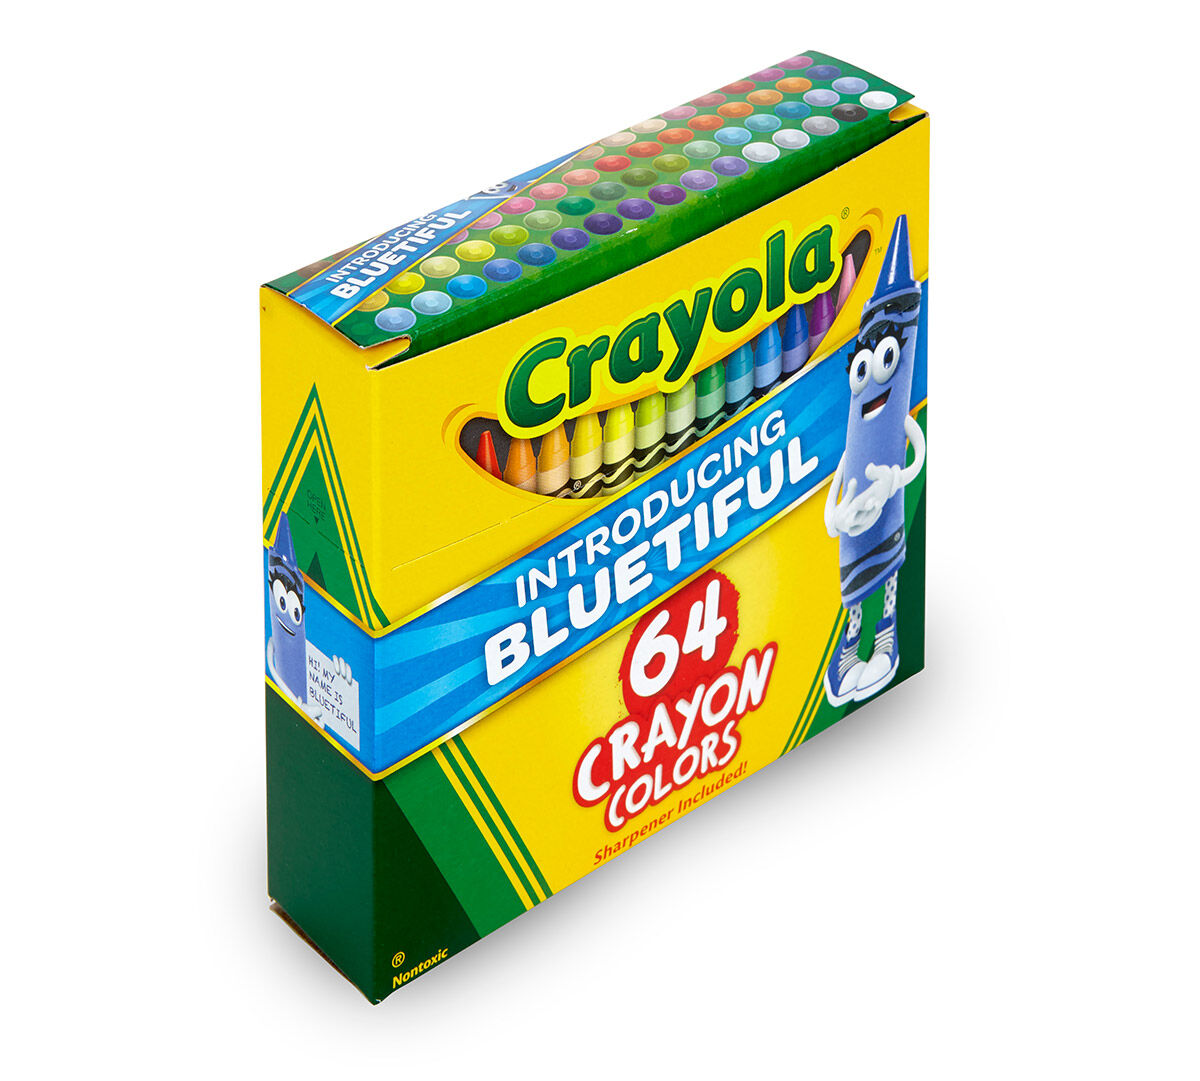 64 Crayola Crayons with Bluetiful | Crayola.com